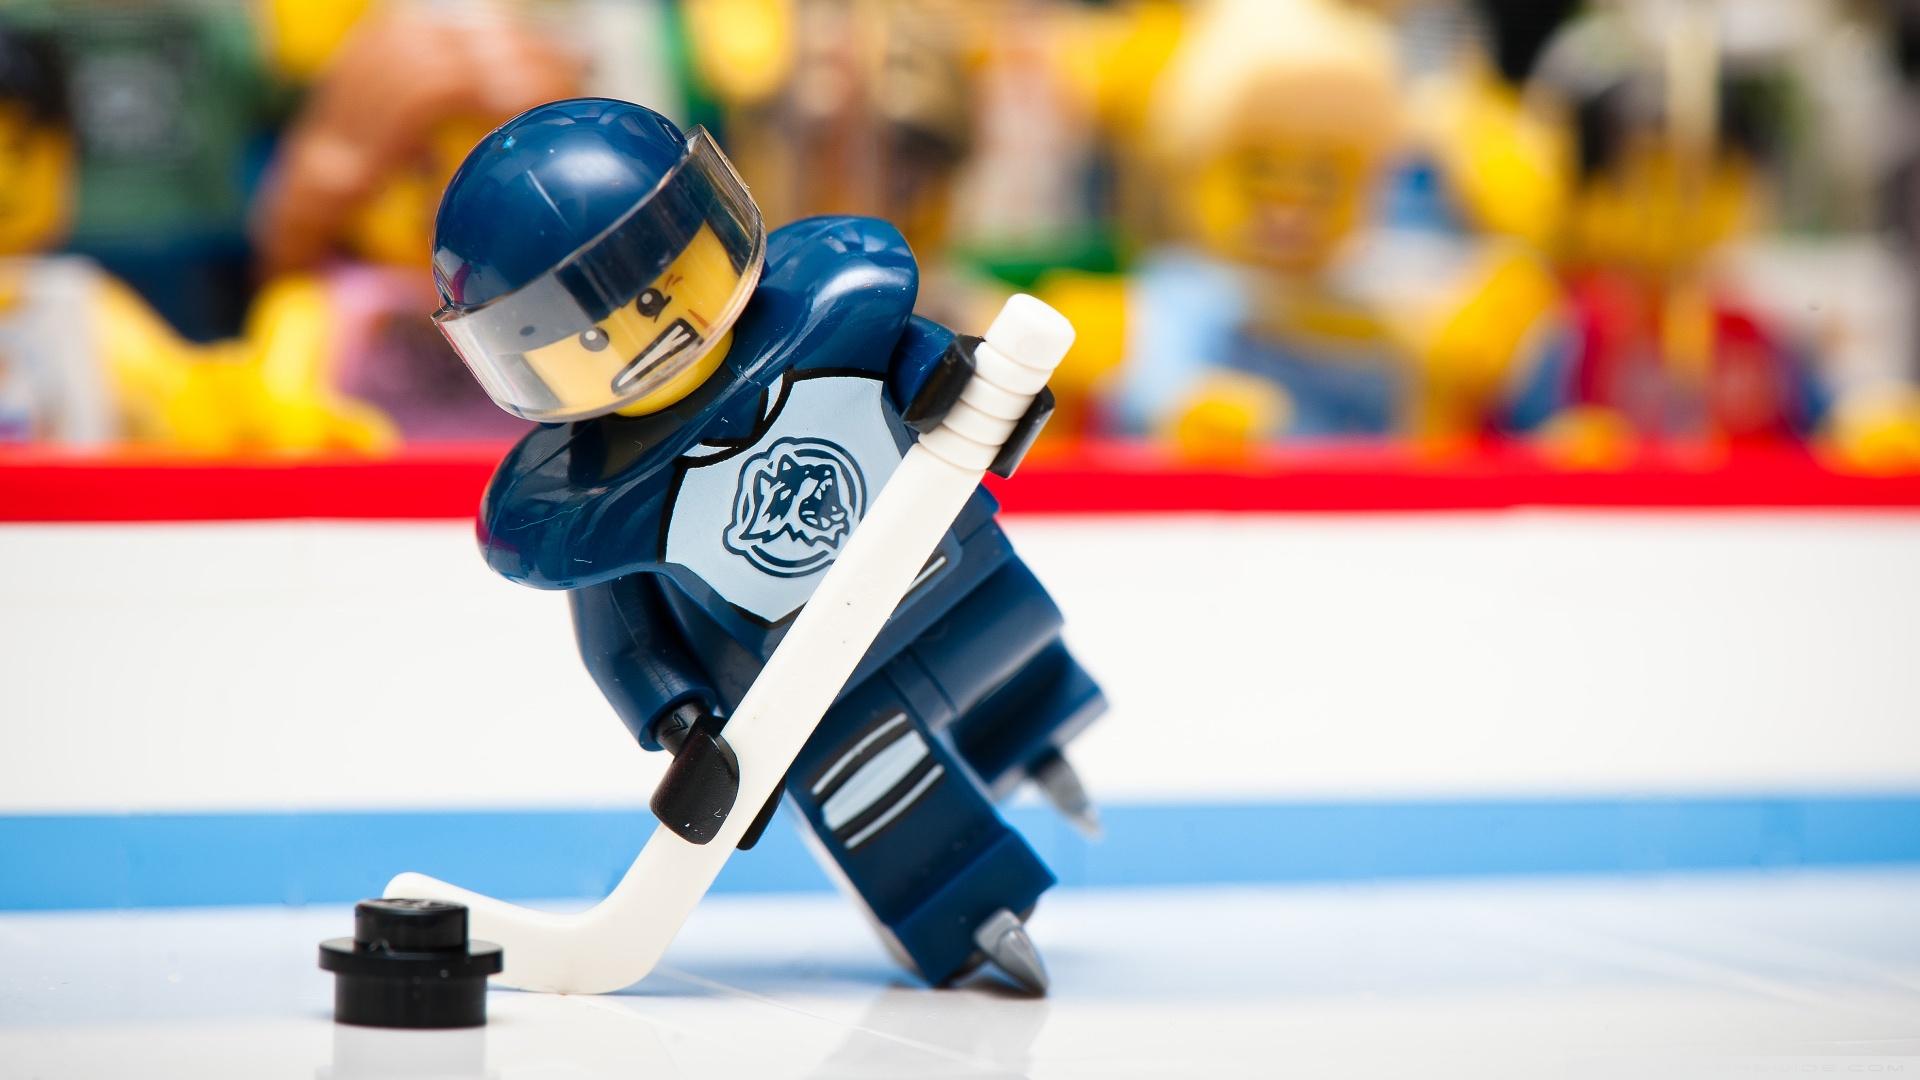 Hockey Lego Wallpaper 1920x1080 Hockey Lego 1920x1080